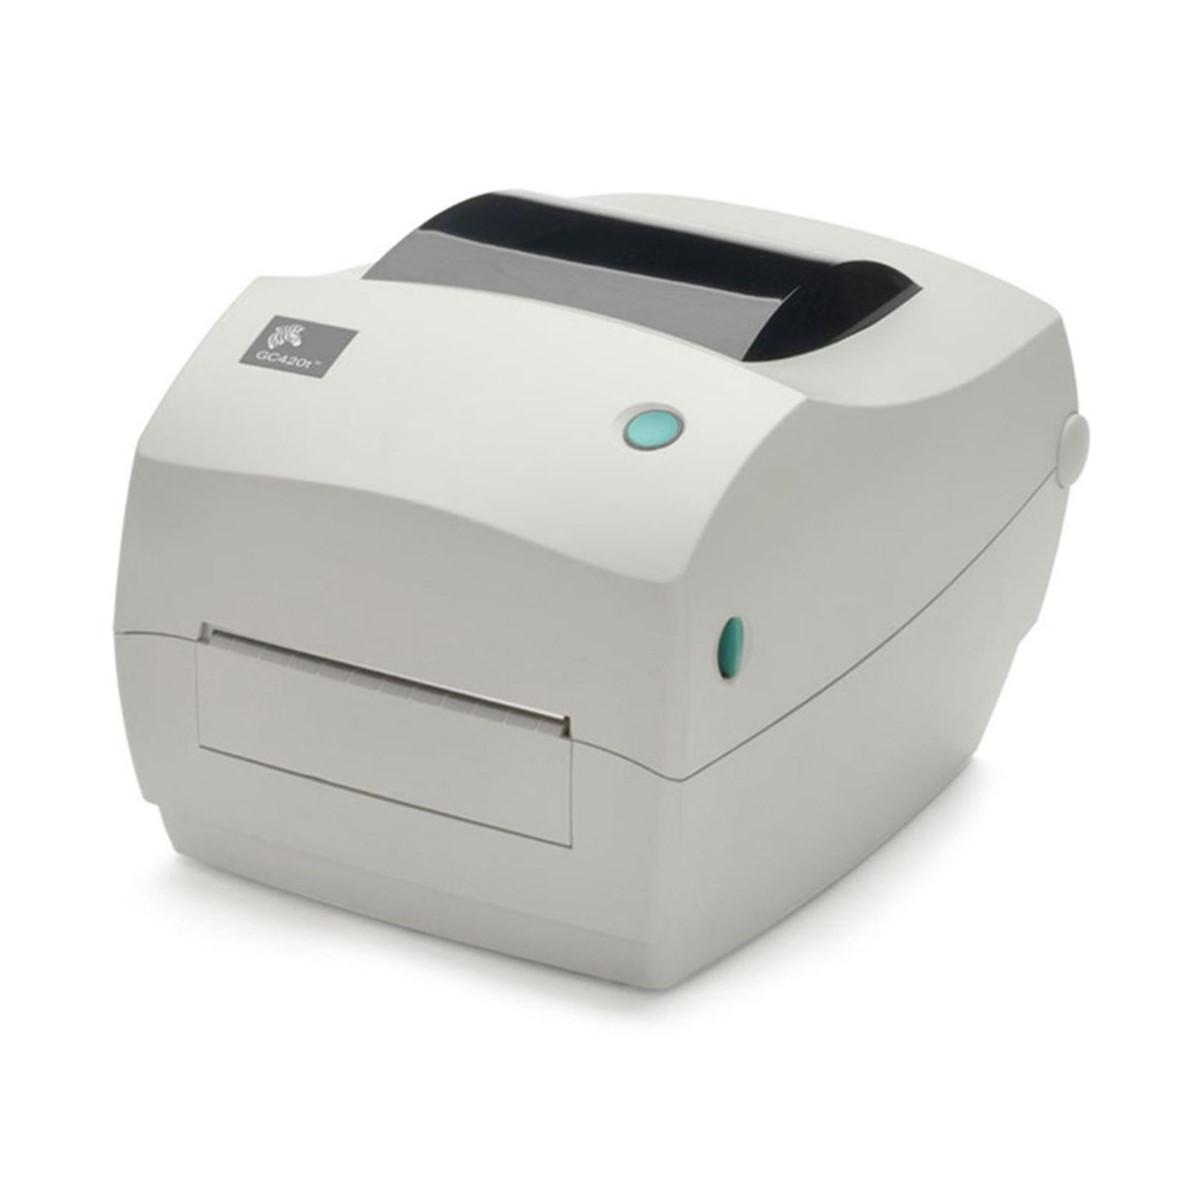 Impressora Térmica GC420T   GC420-1005A0-000   Zebra